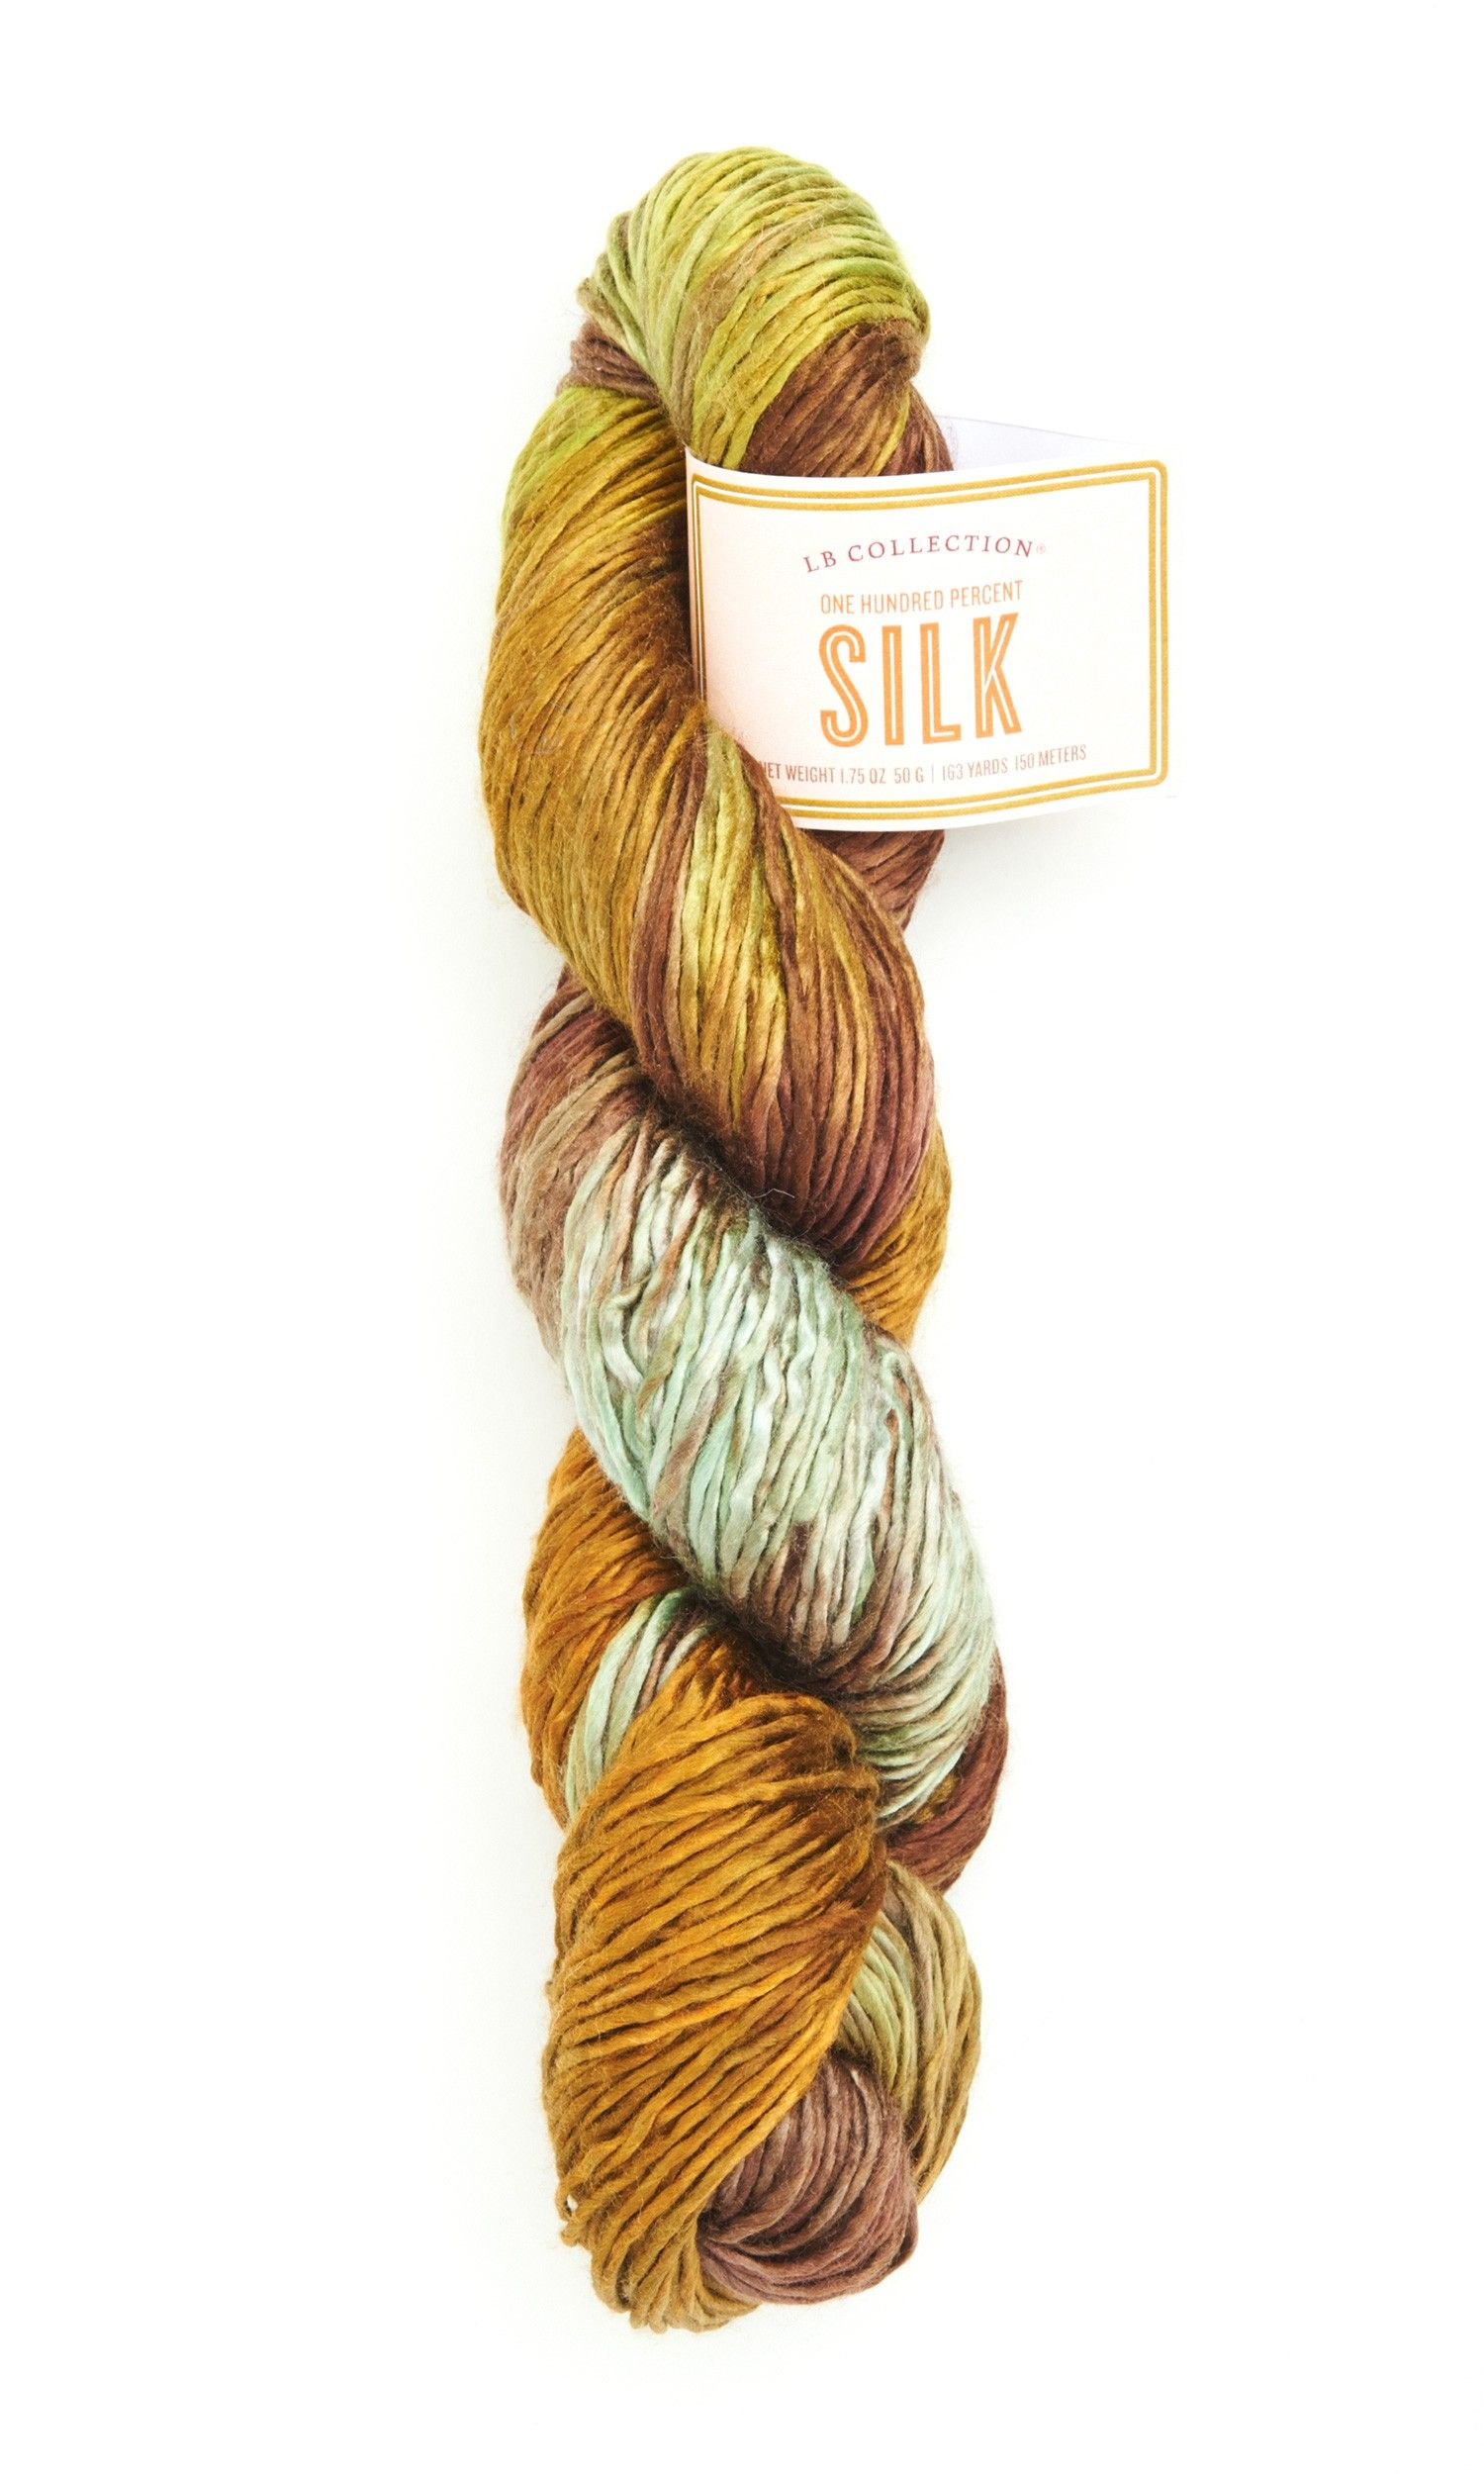 LB Collection® Silk Yarn   Yarn   Pinterest